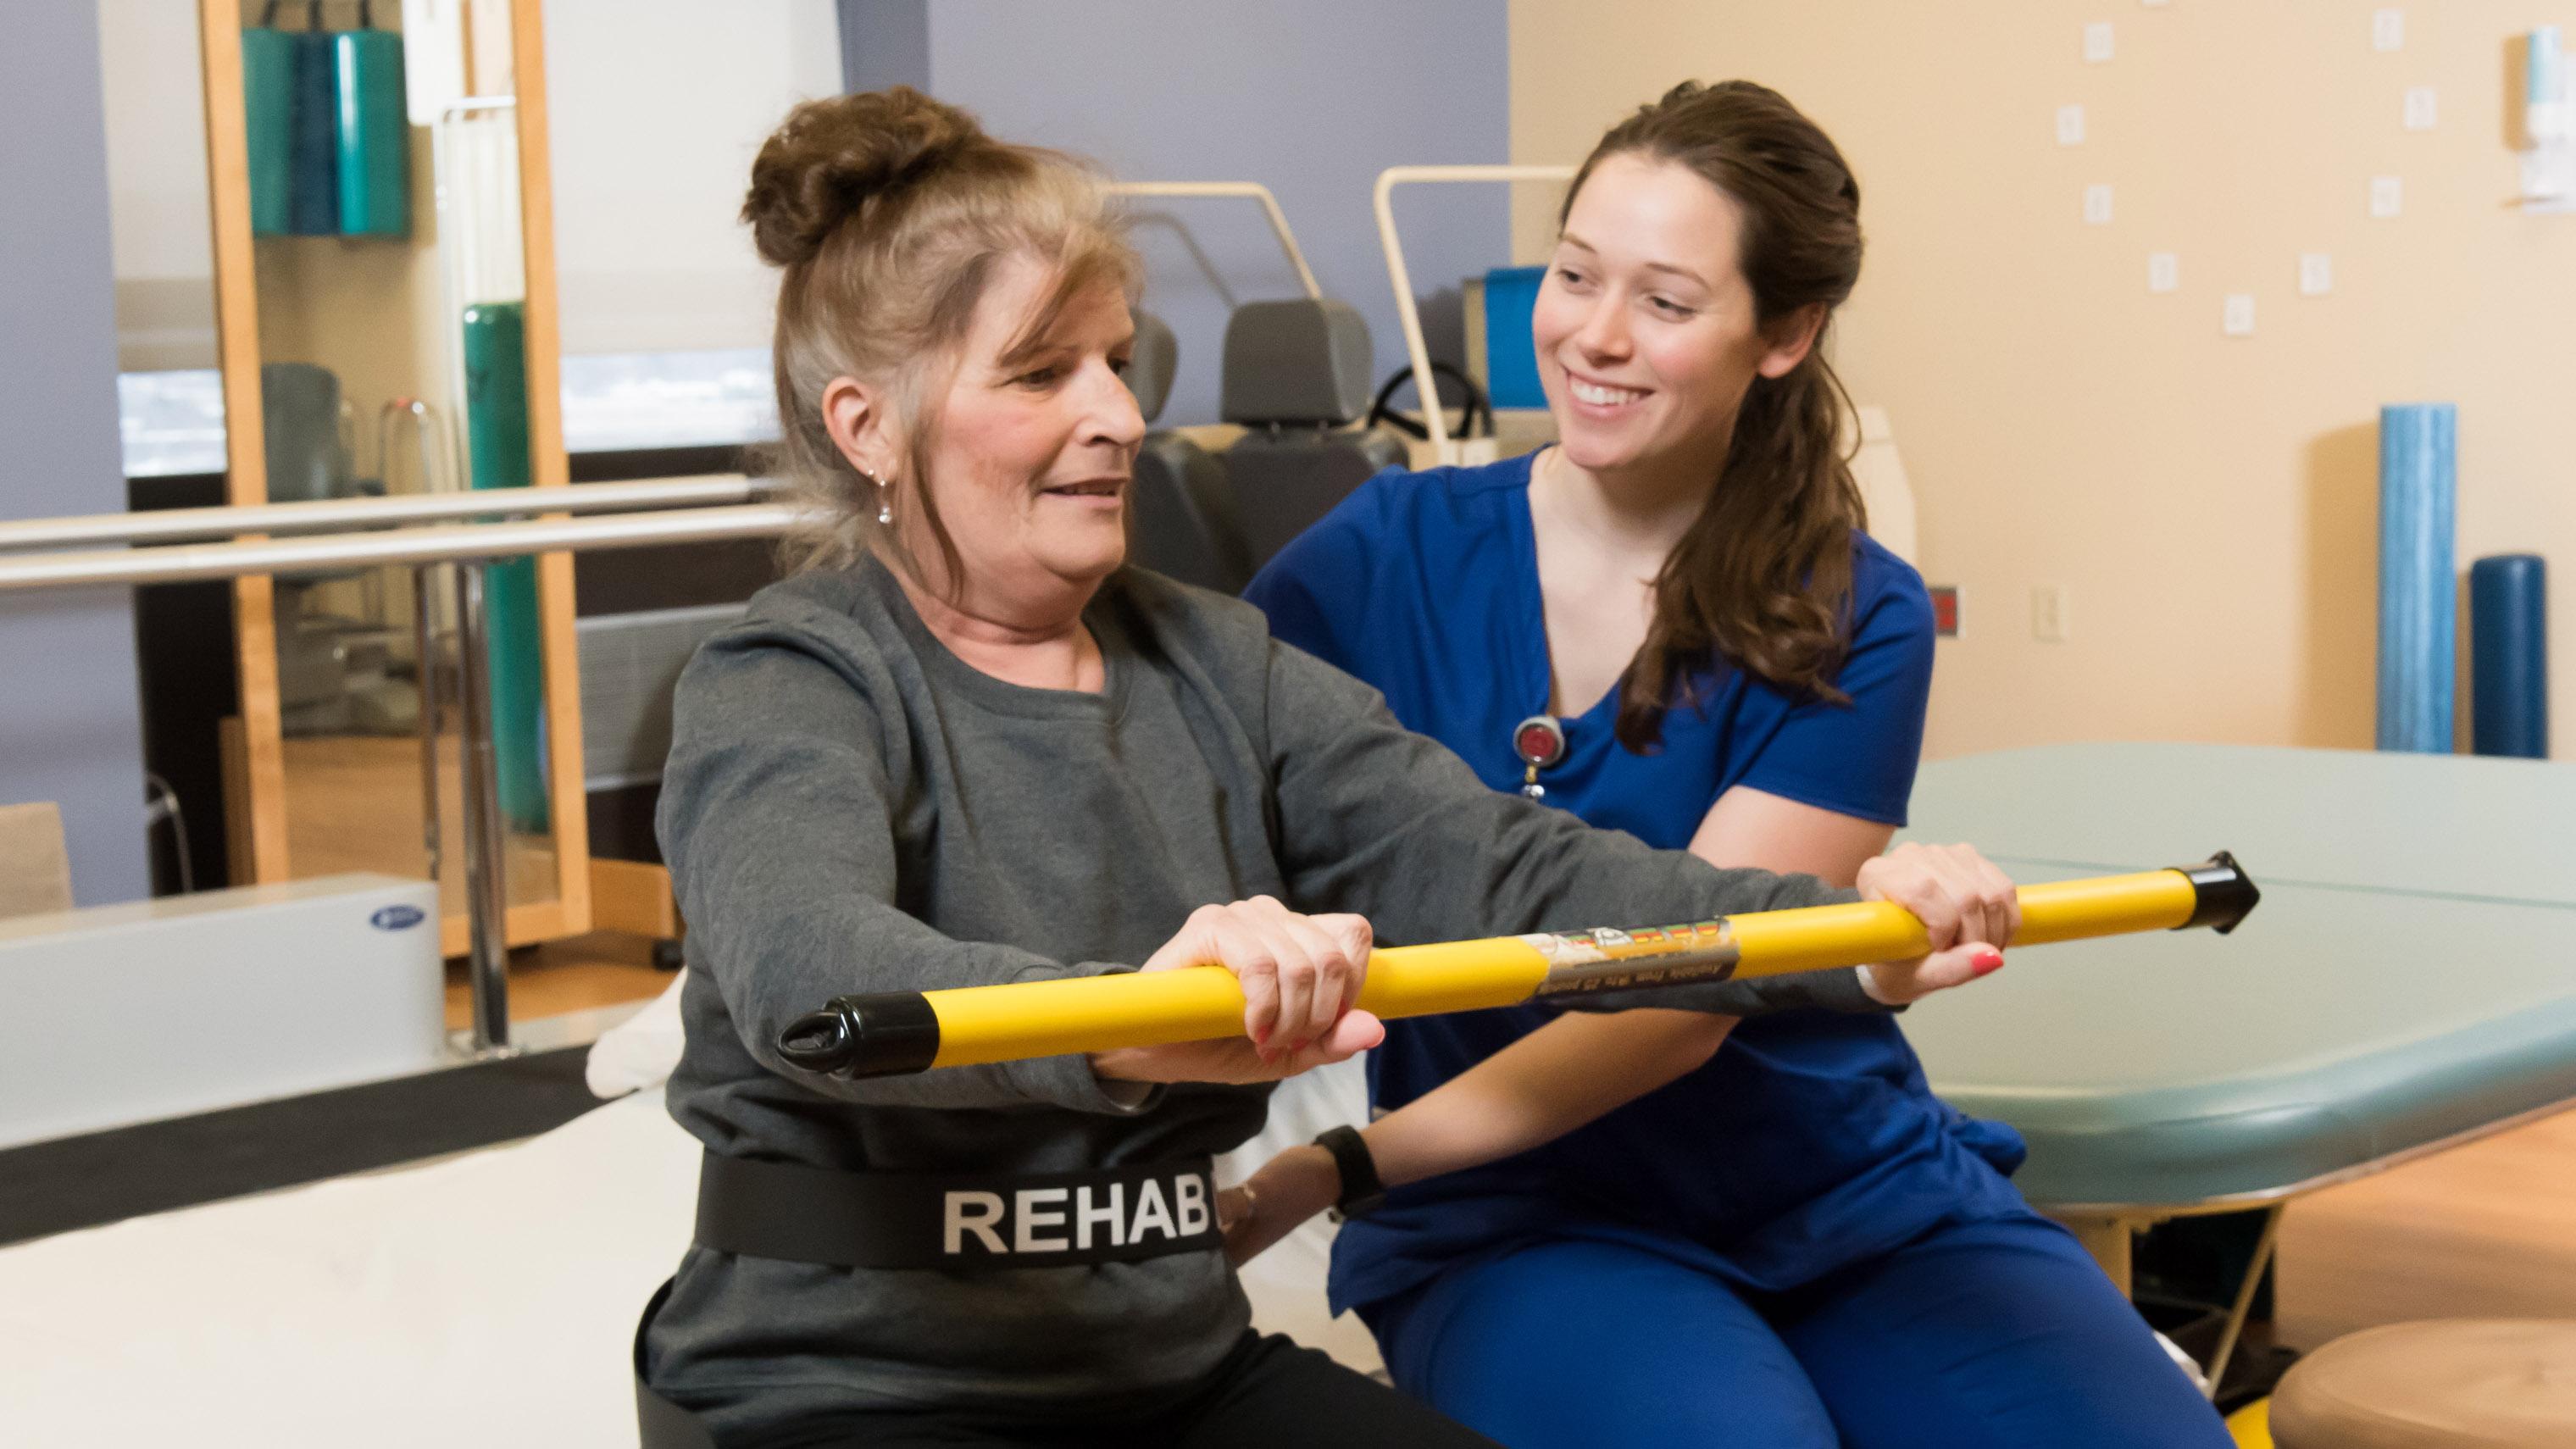 Hurley Medical Center rehab, Flint MI photo Doug Pike